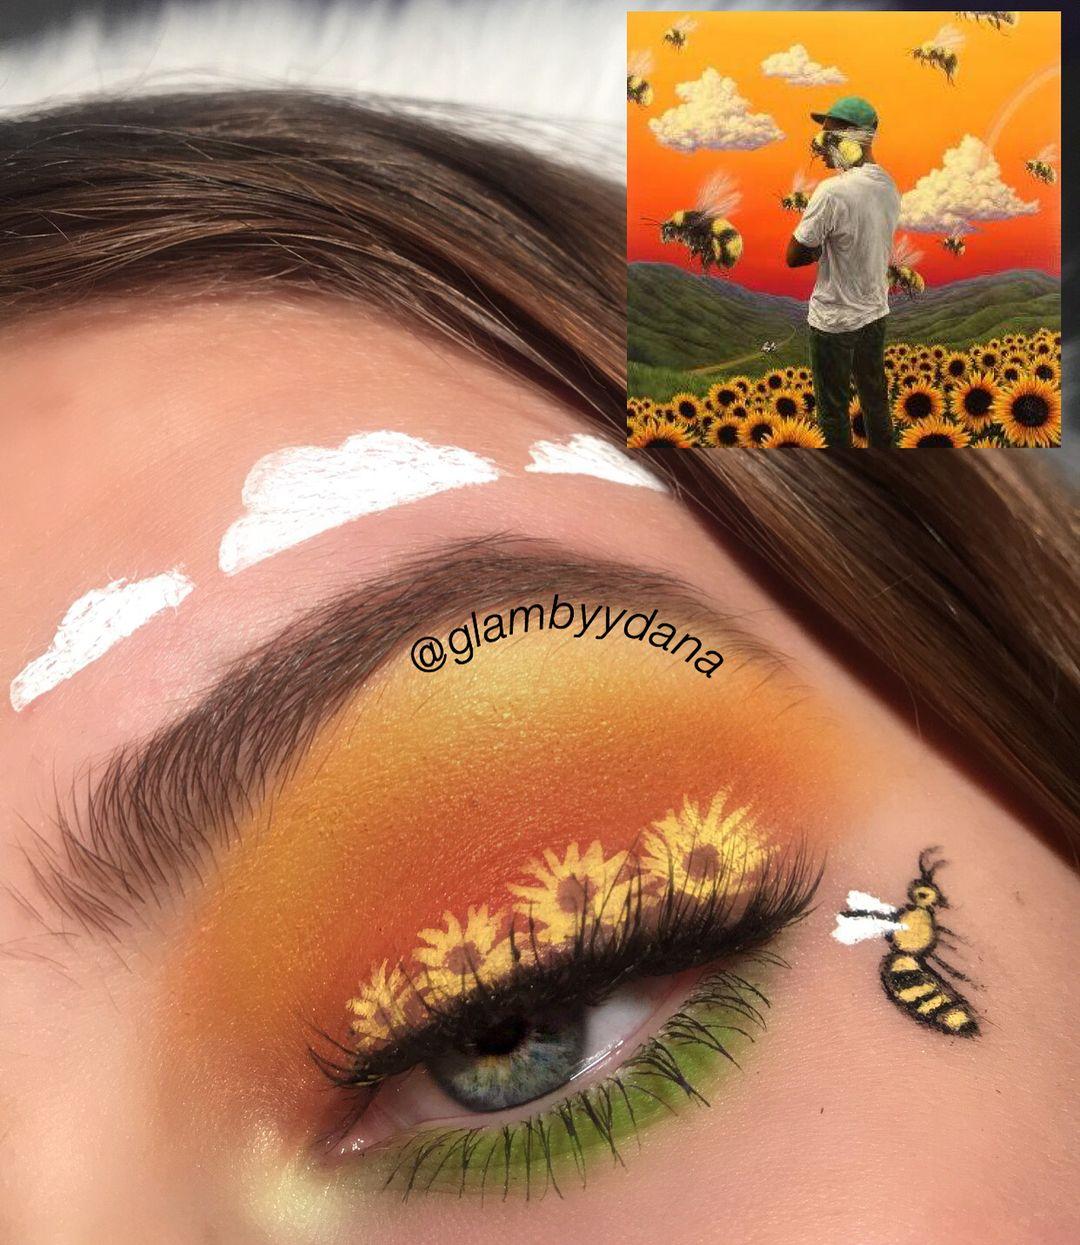 FLOWER BOY inspired makeup look this album cover is sooooo